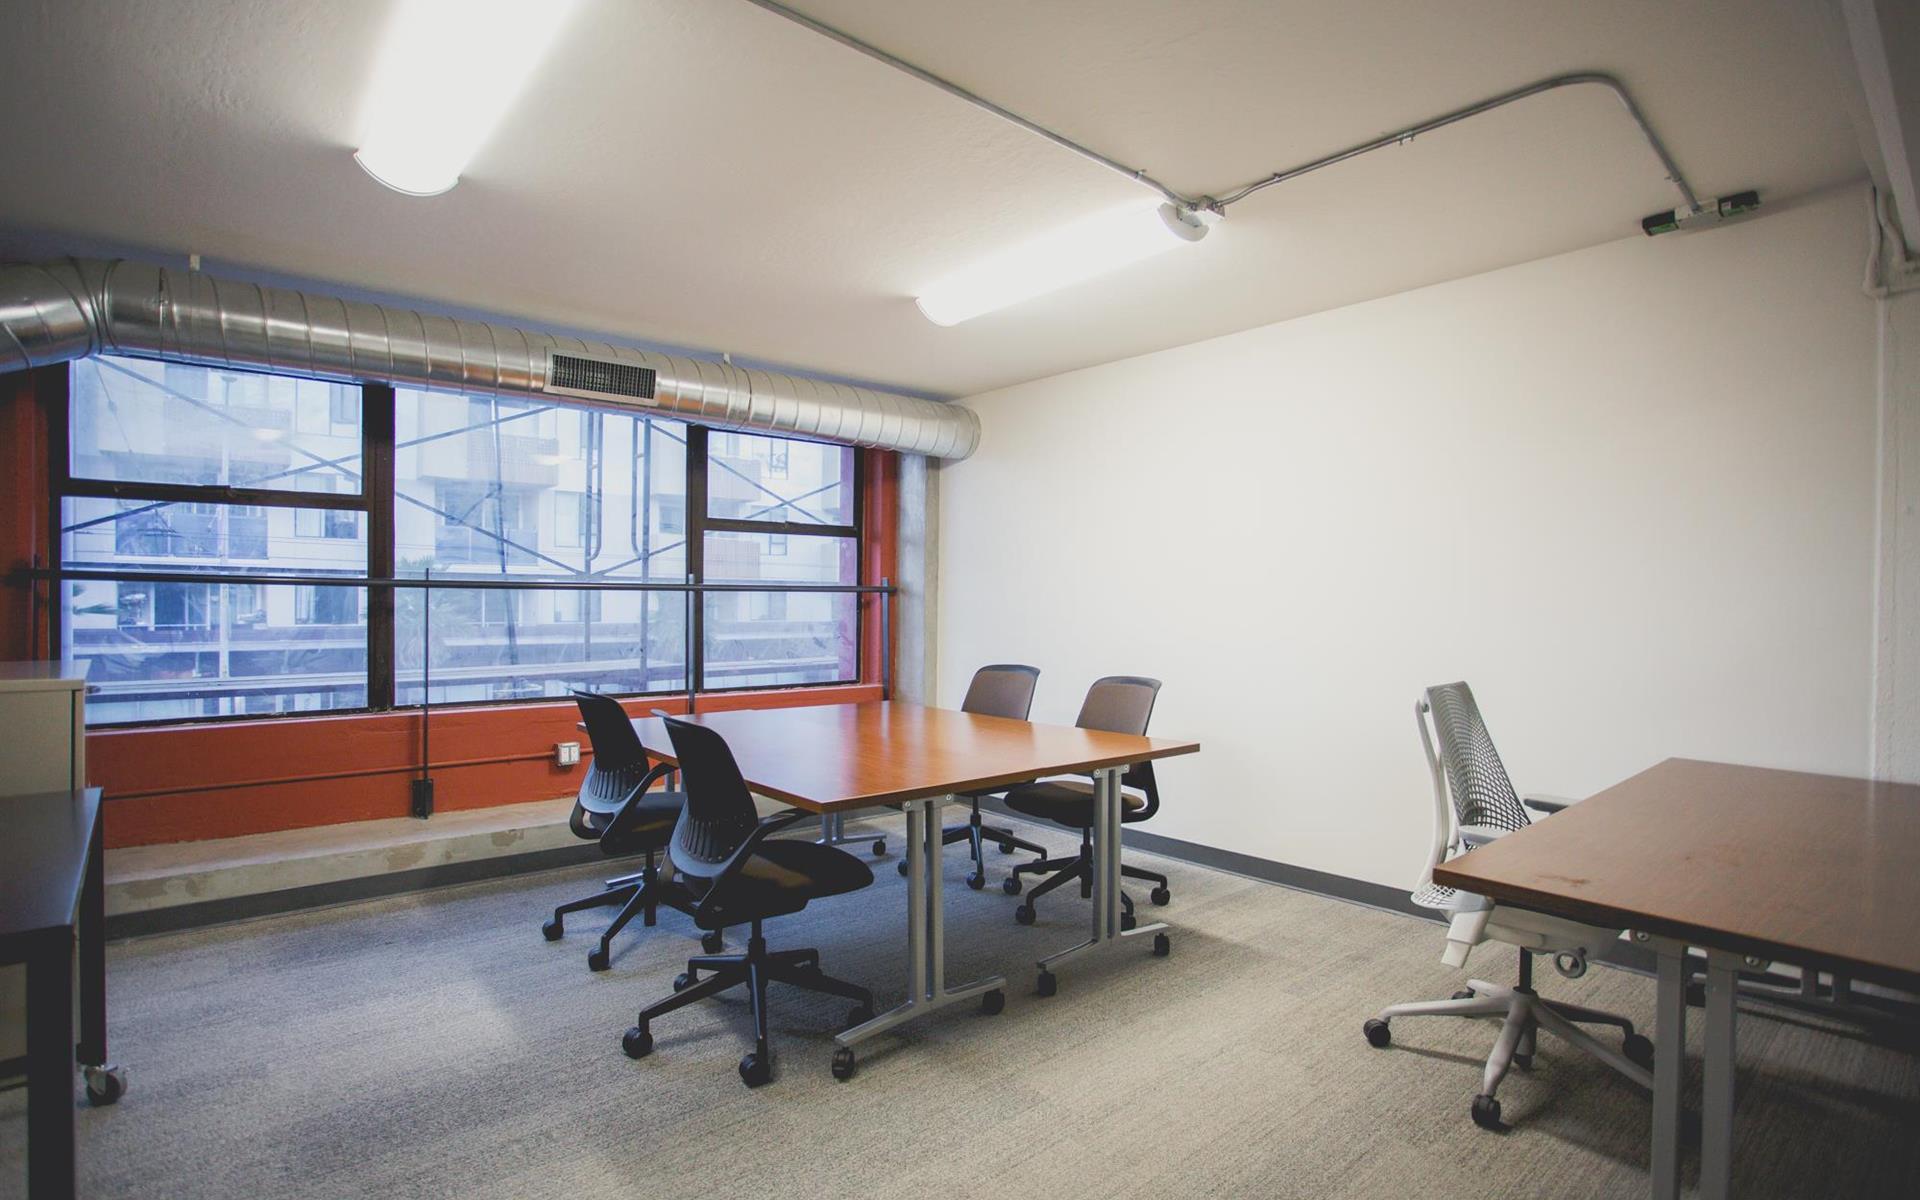 Impact Hub San Francisco - Team office for 5